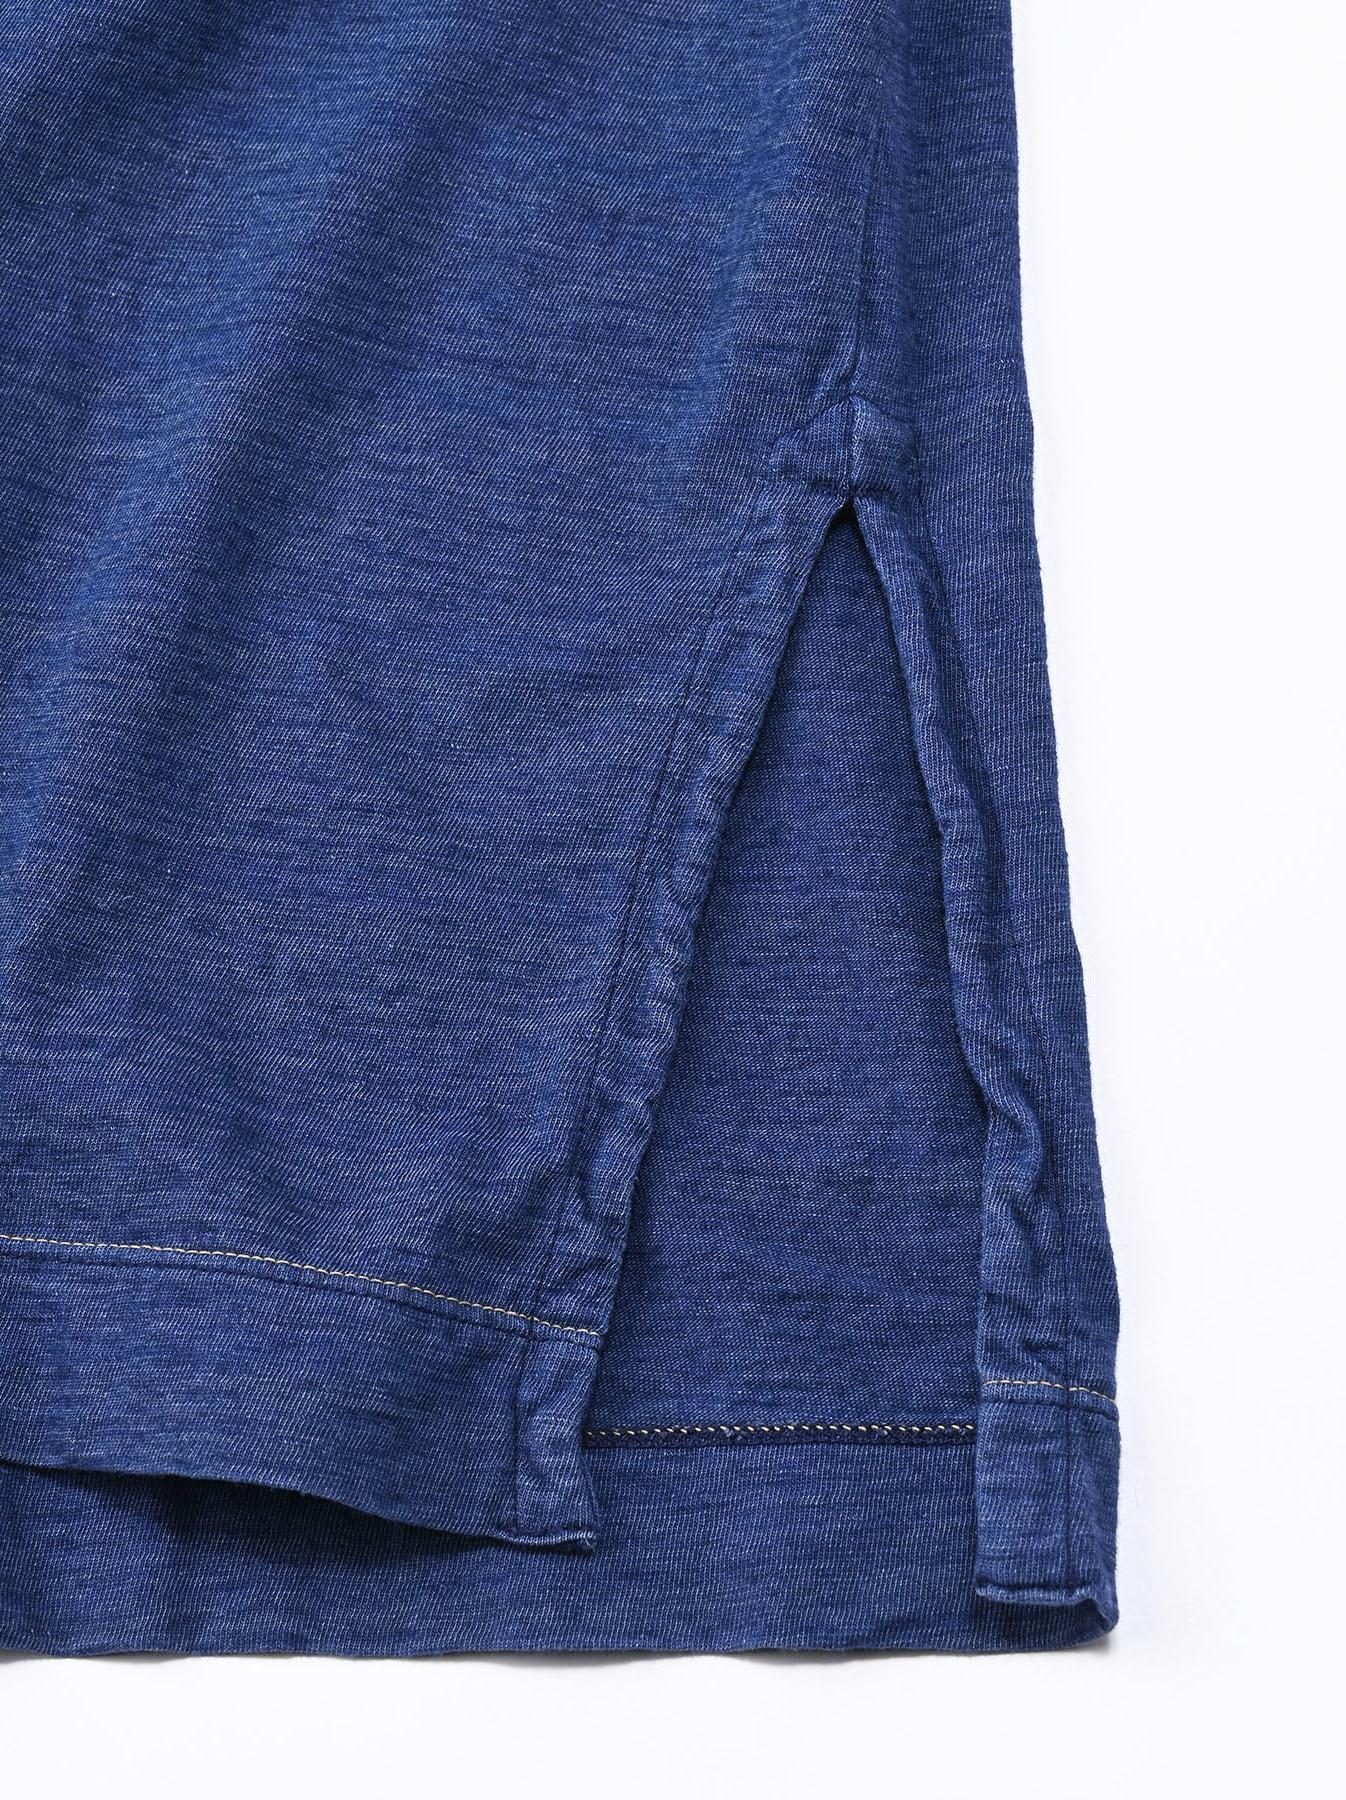 Distressed Indigo Lei Lei Print Big Slit T-shirt (0621)-11